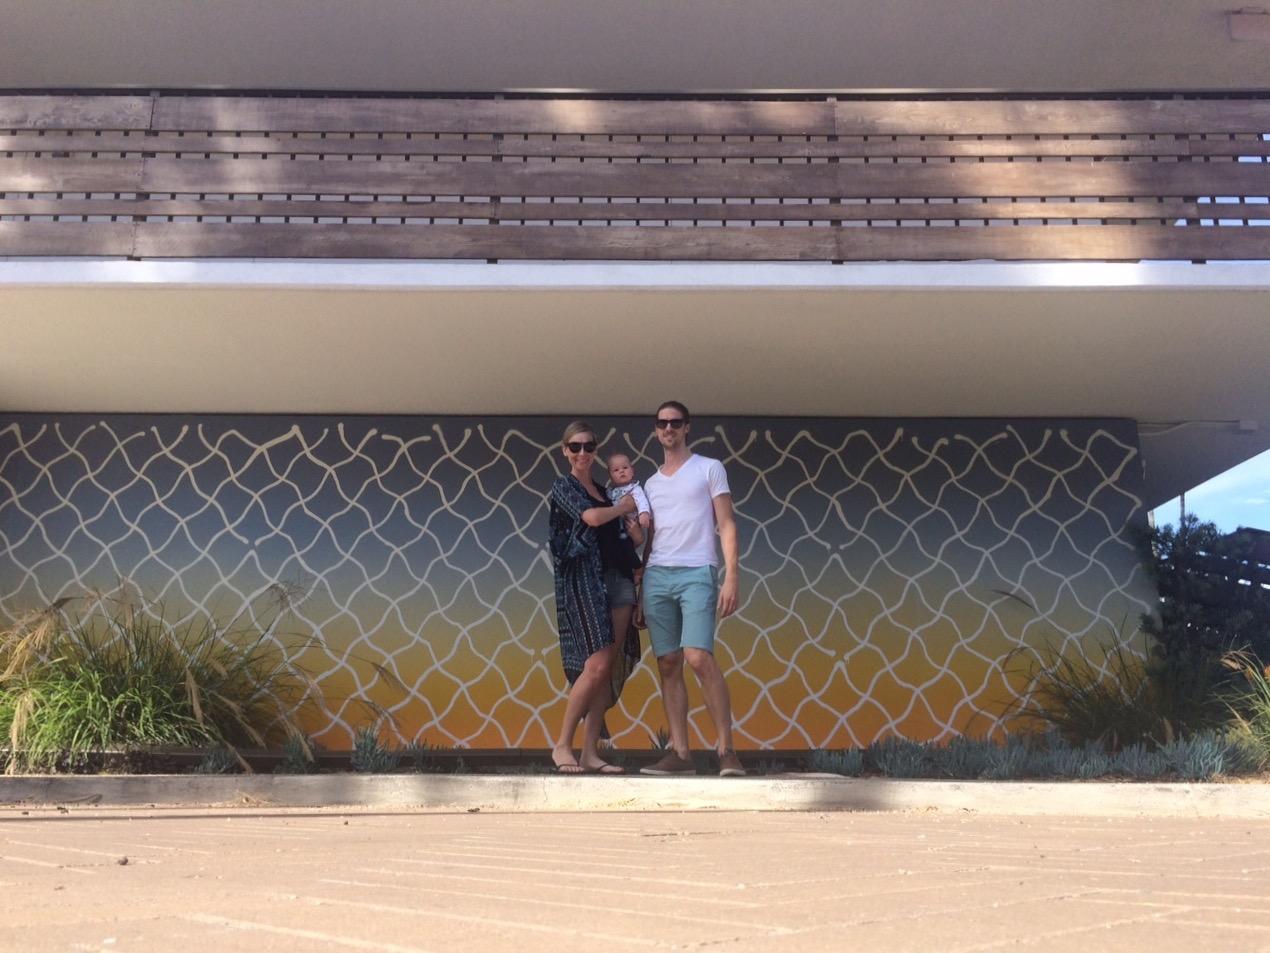 La familia in Santa Barbara. Read about Santa Barbara's new wave of trendsetters in my article,  Santa Barbara Beyond the Break , in the Expedia Viewfinder.